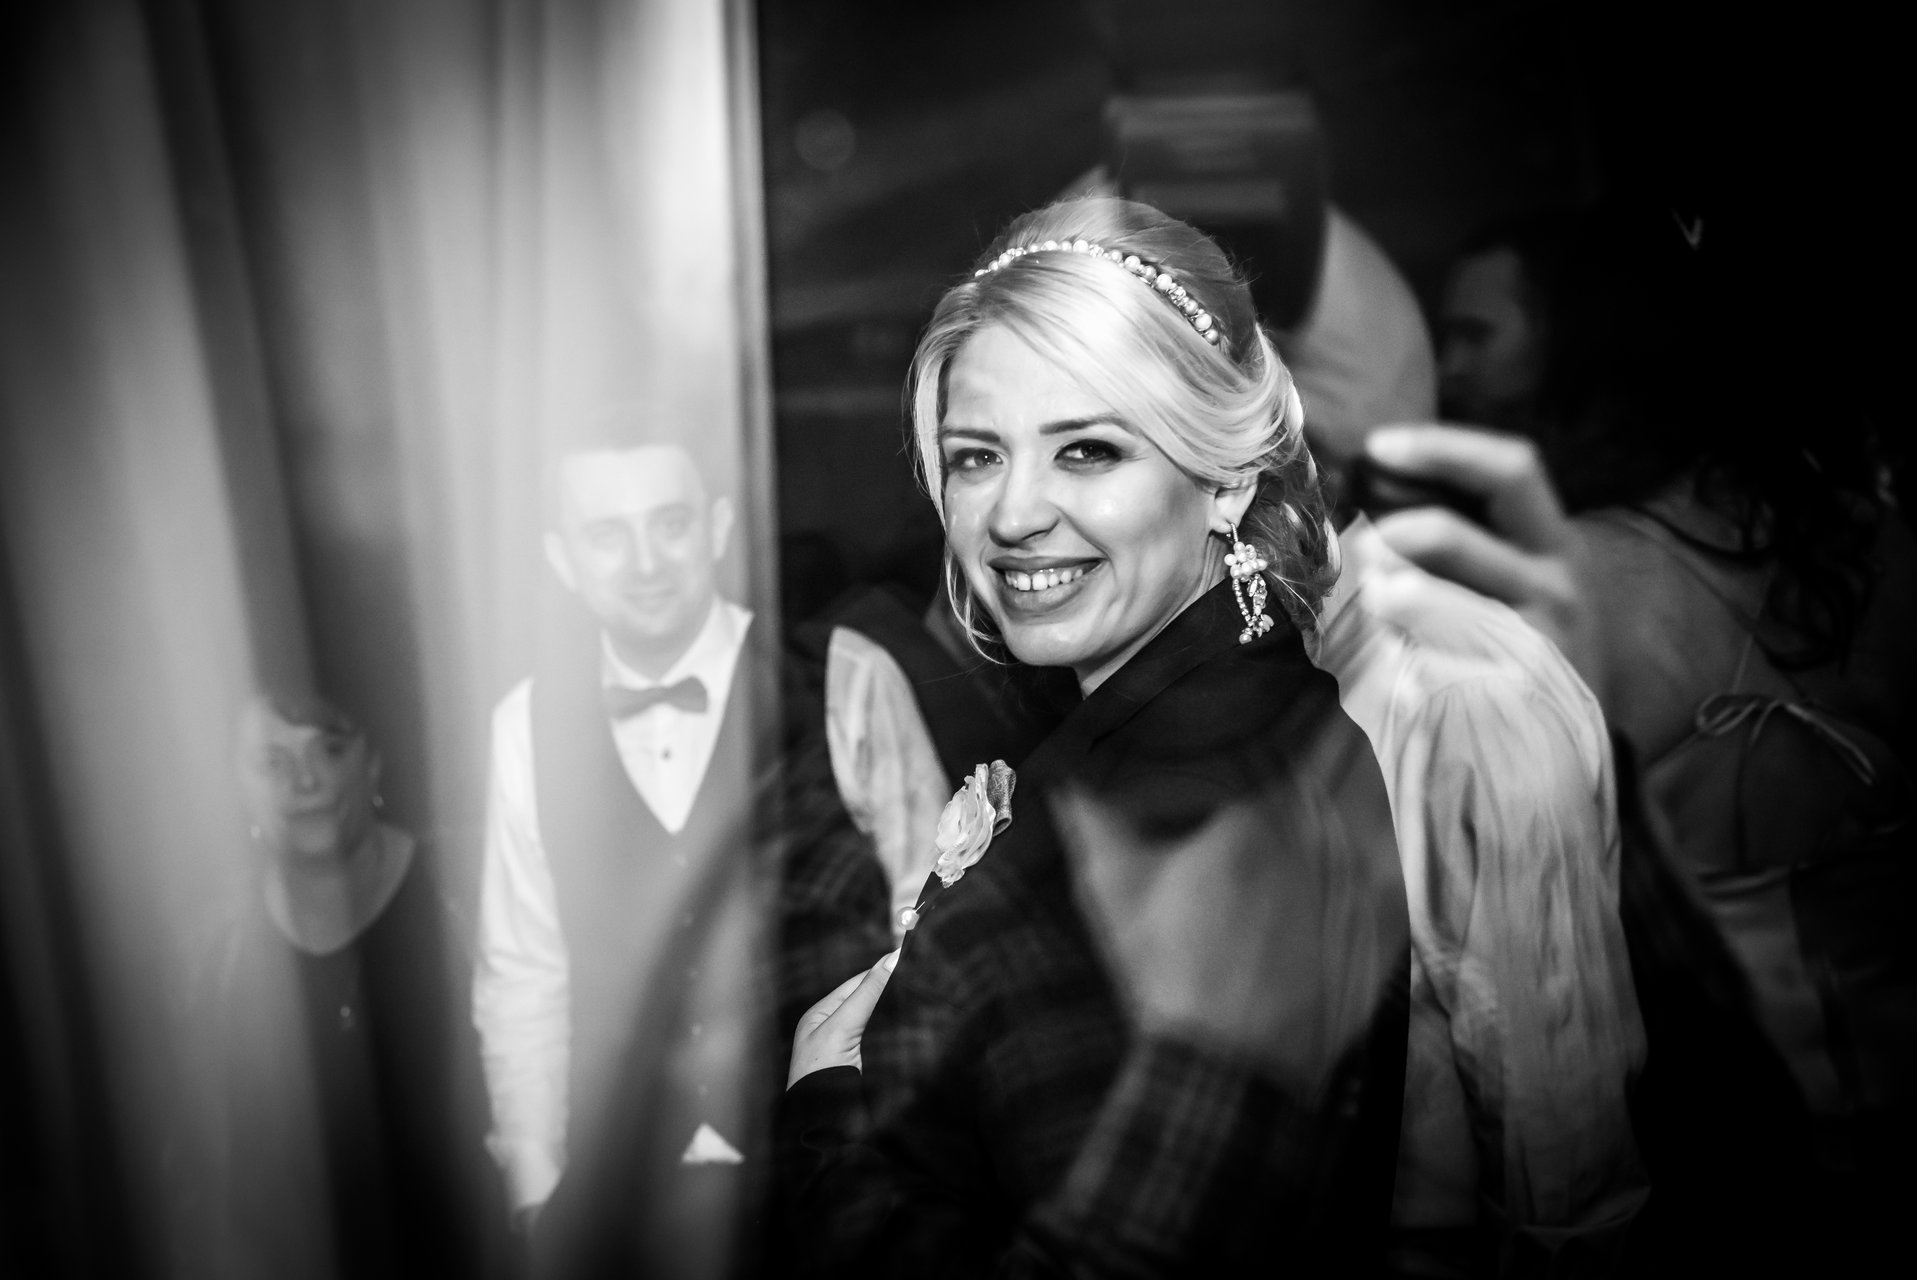 Mirror_Less   Author Никола Зафиров - starswriter   PHOTO FORUM